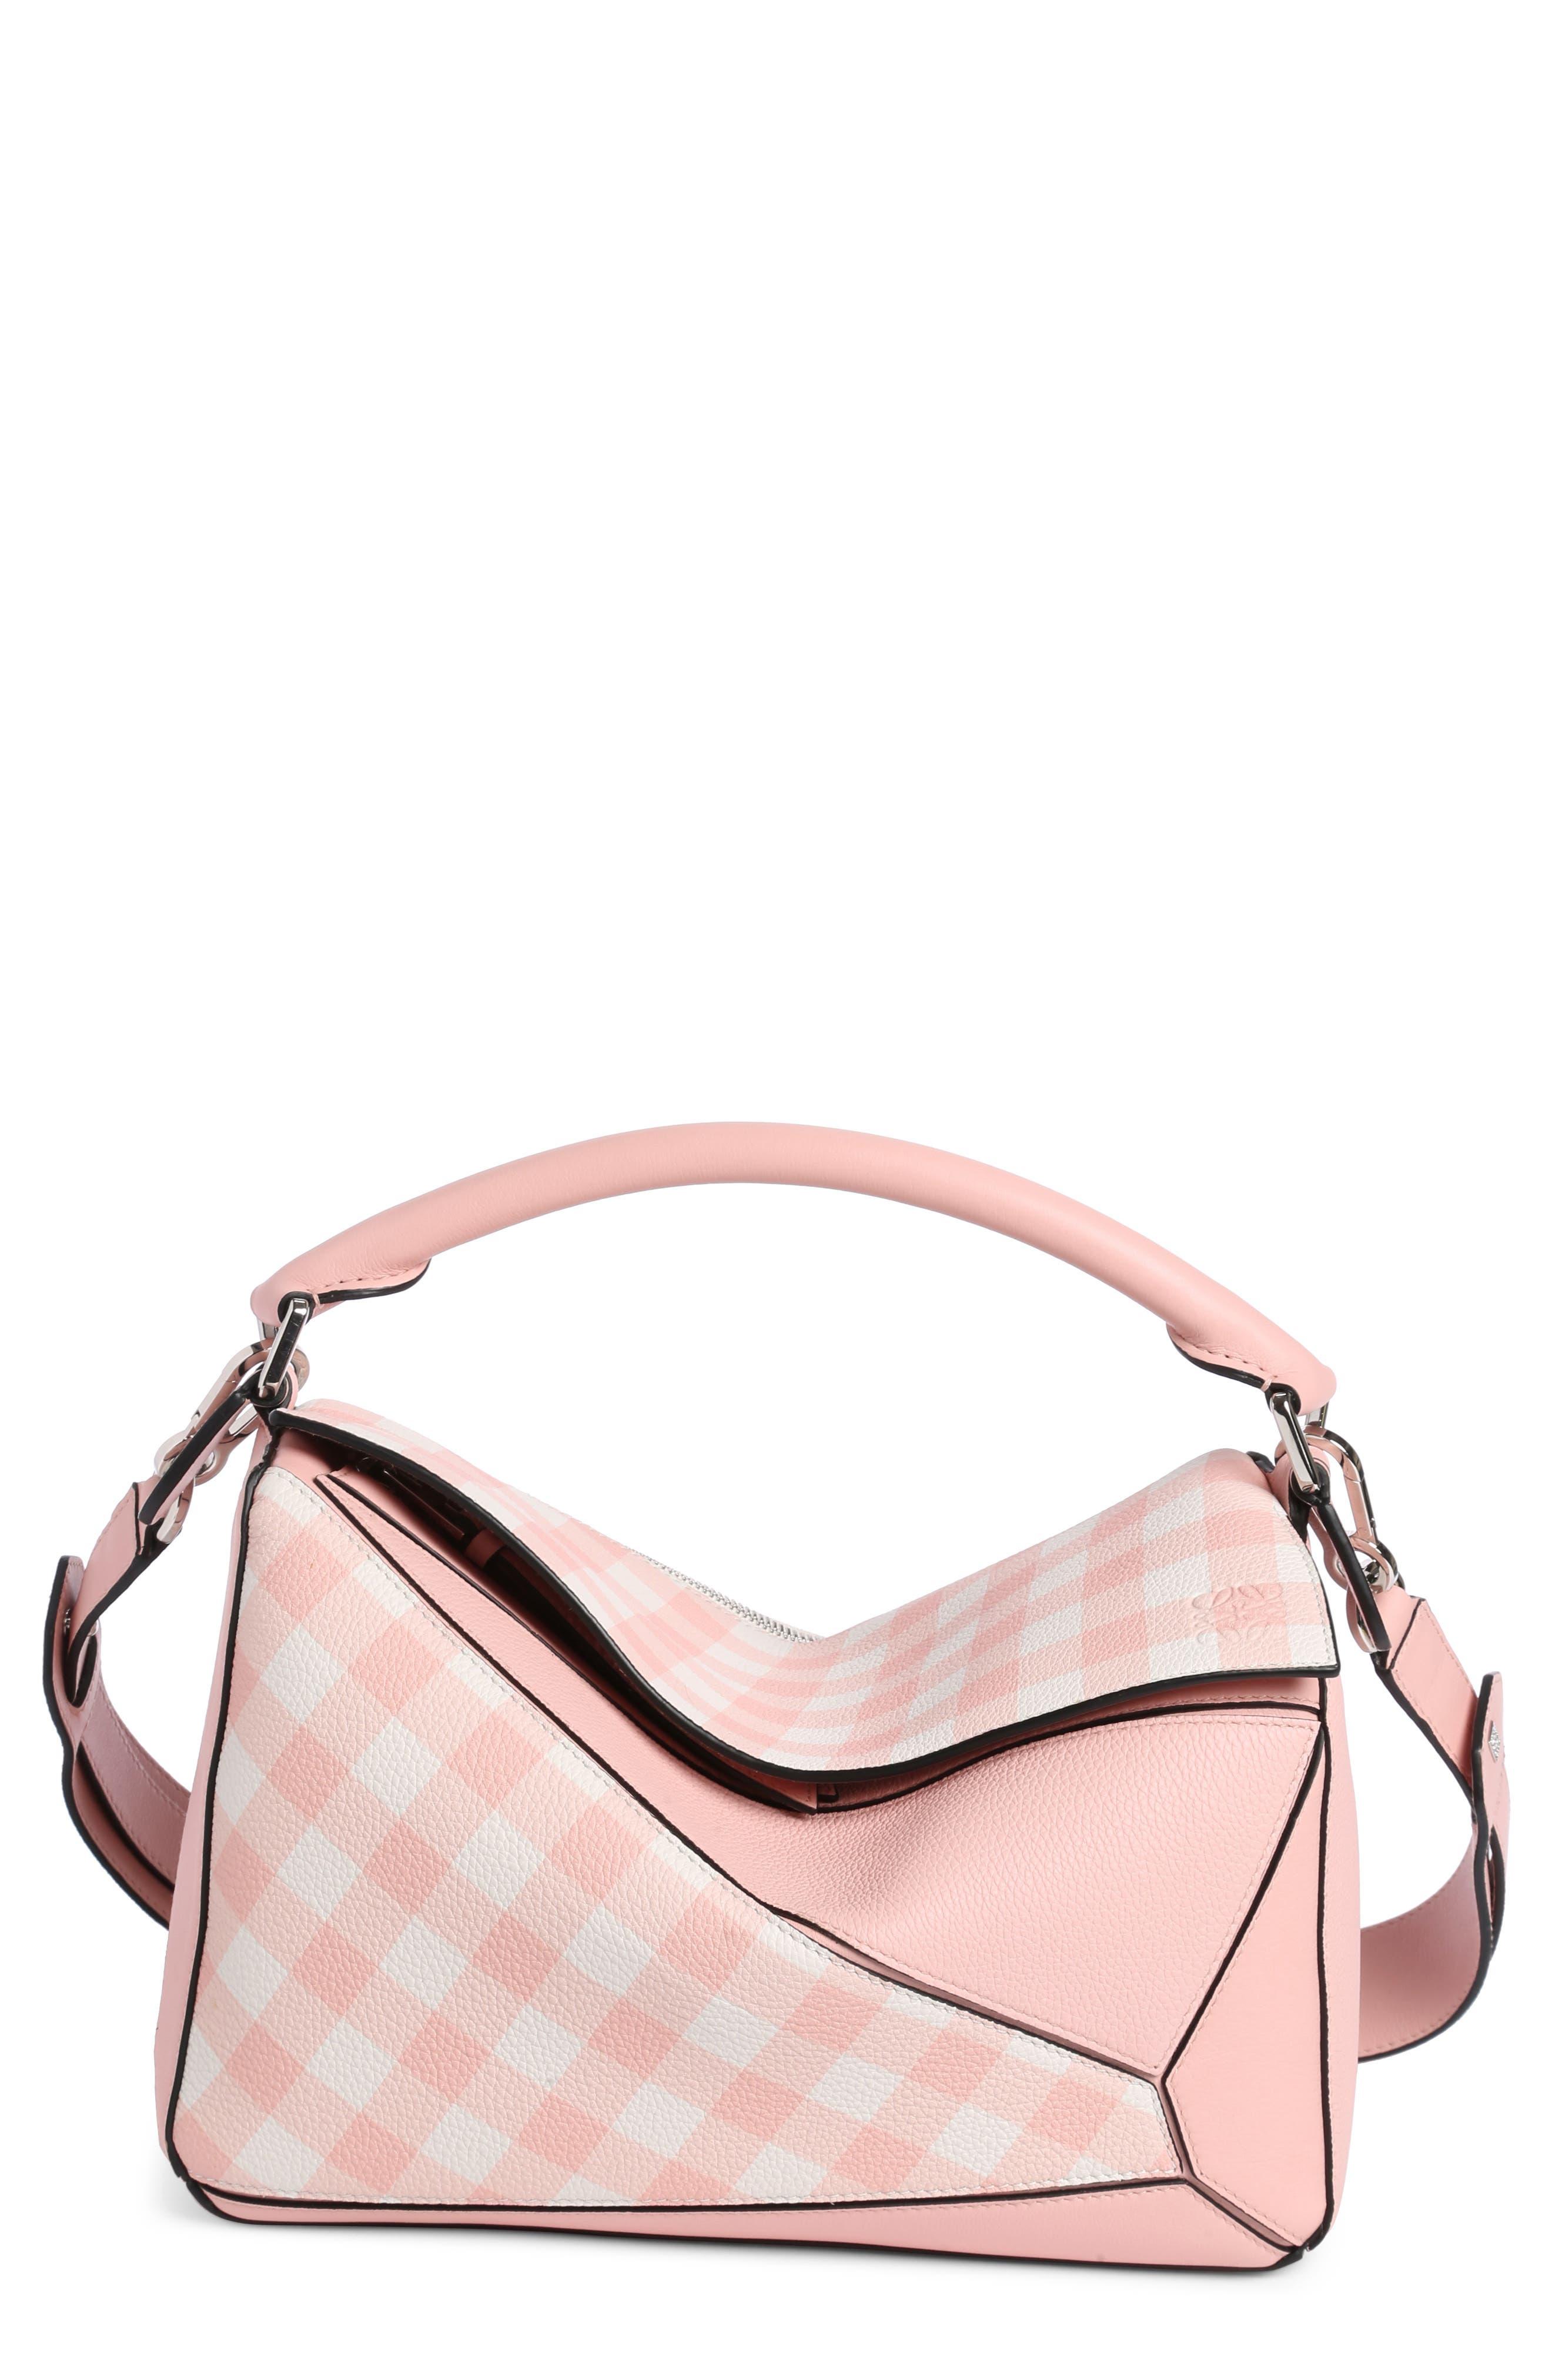 Loewe Puzzle Gingham Calfskin Leather Bag